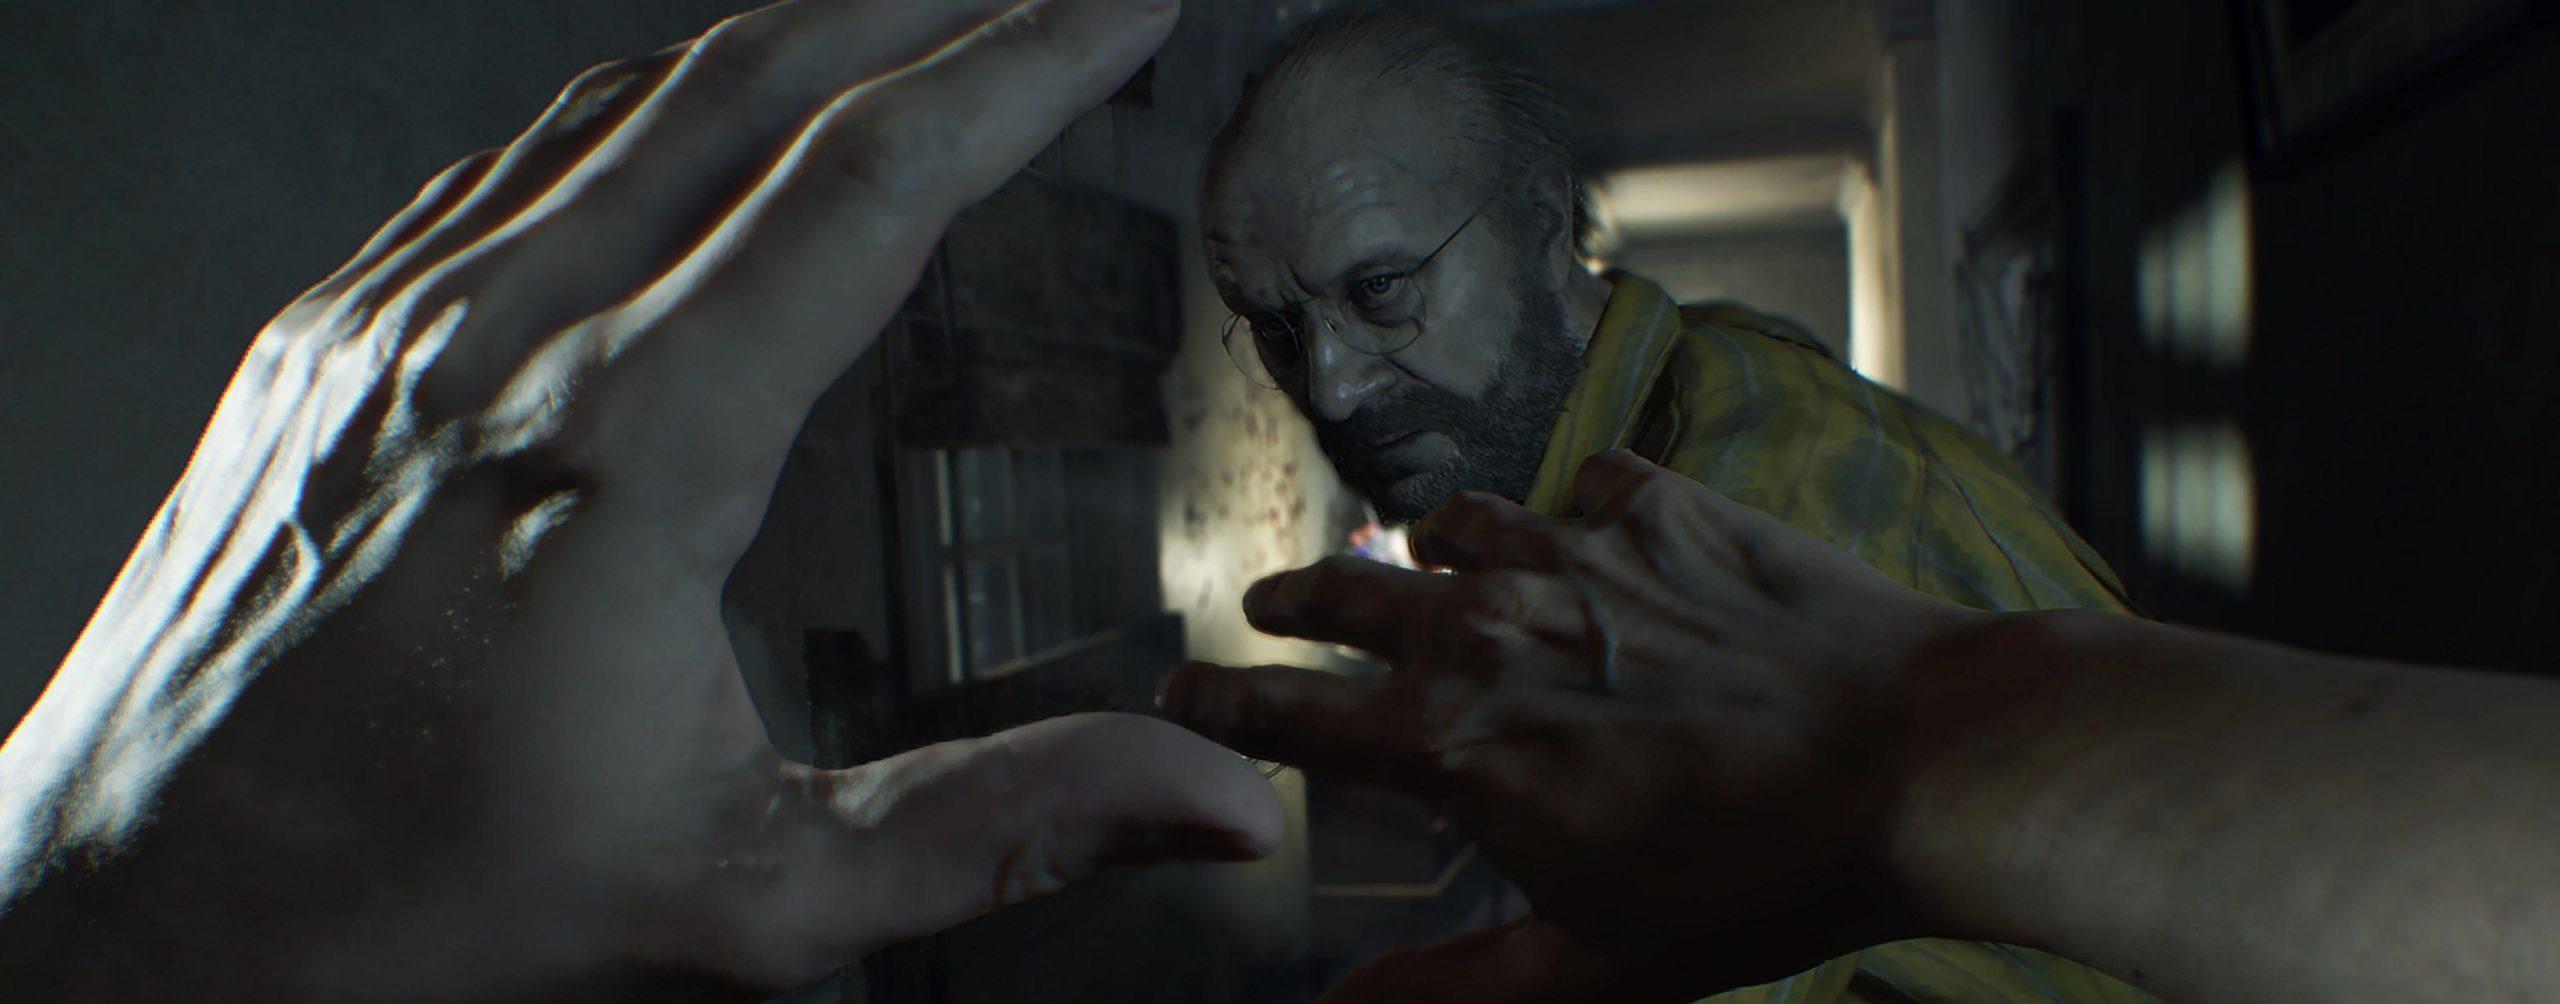 Resident Evil Village Playtest Information Leaks from